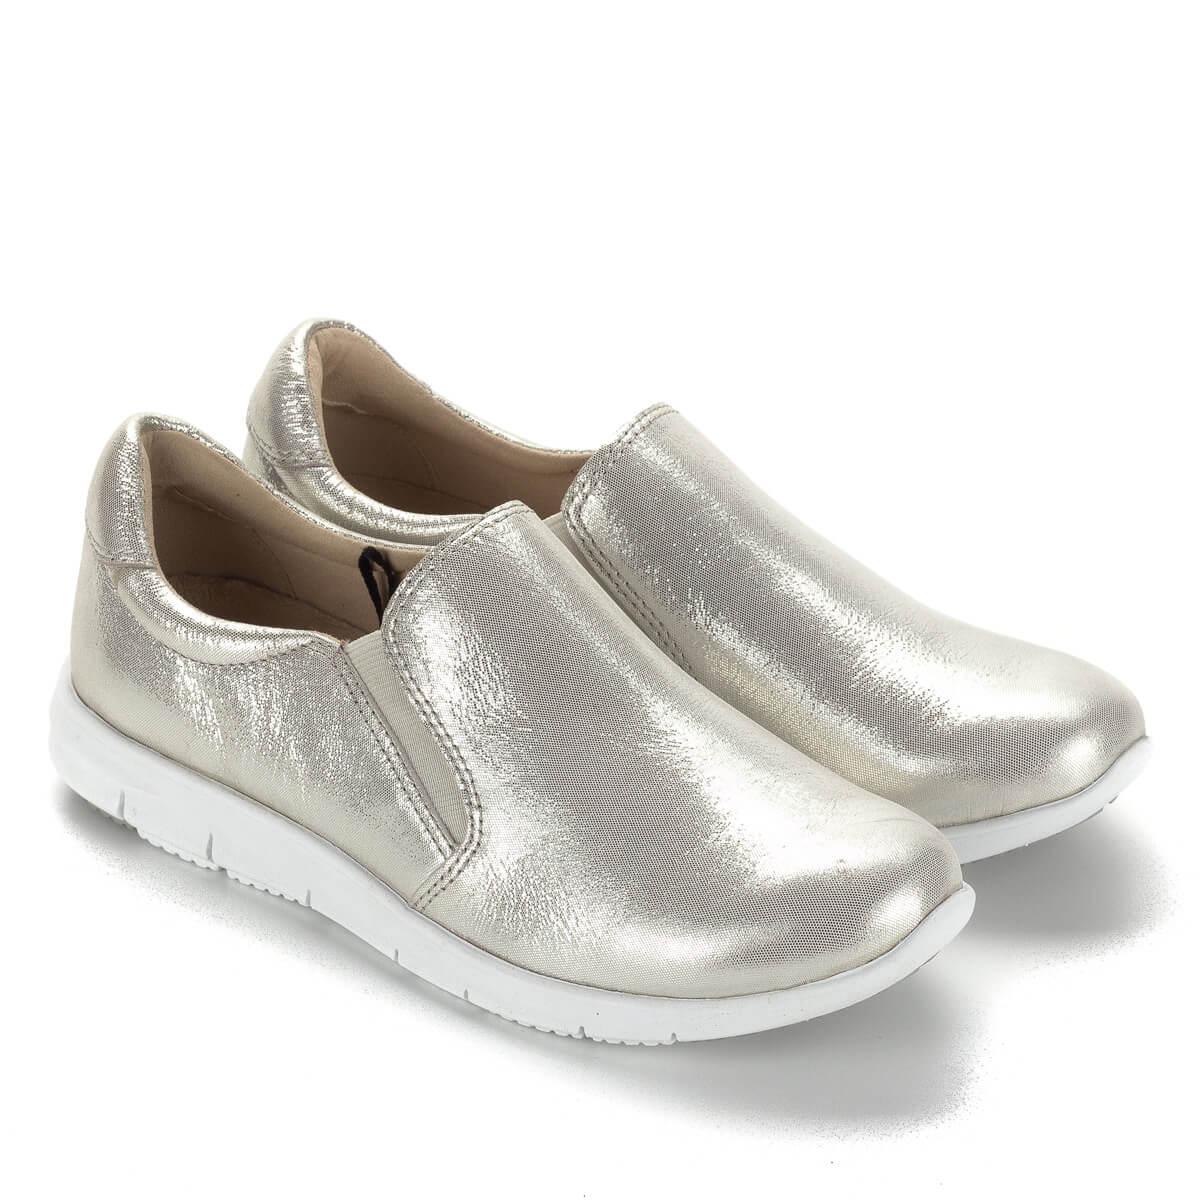 Csillogós Caprice sportos cipő